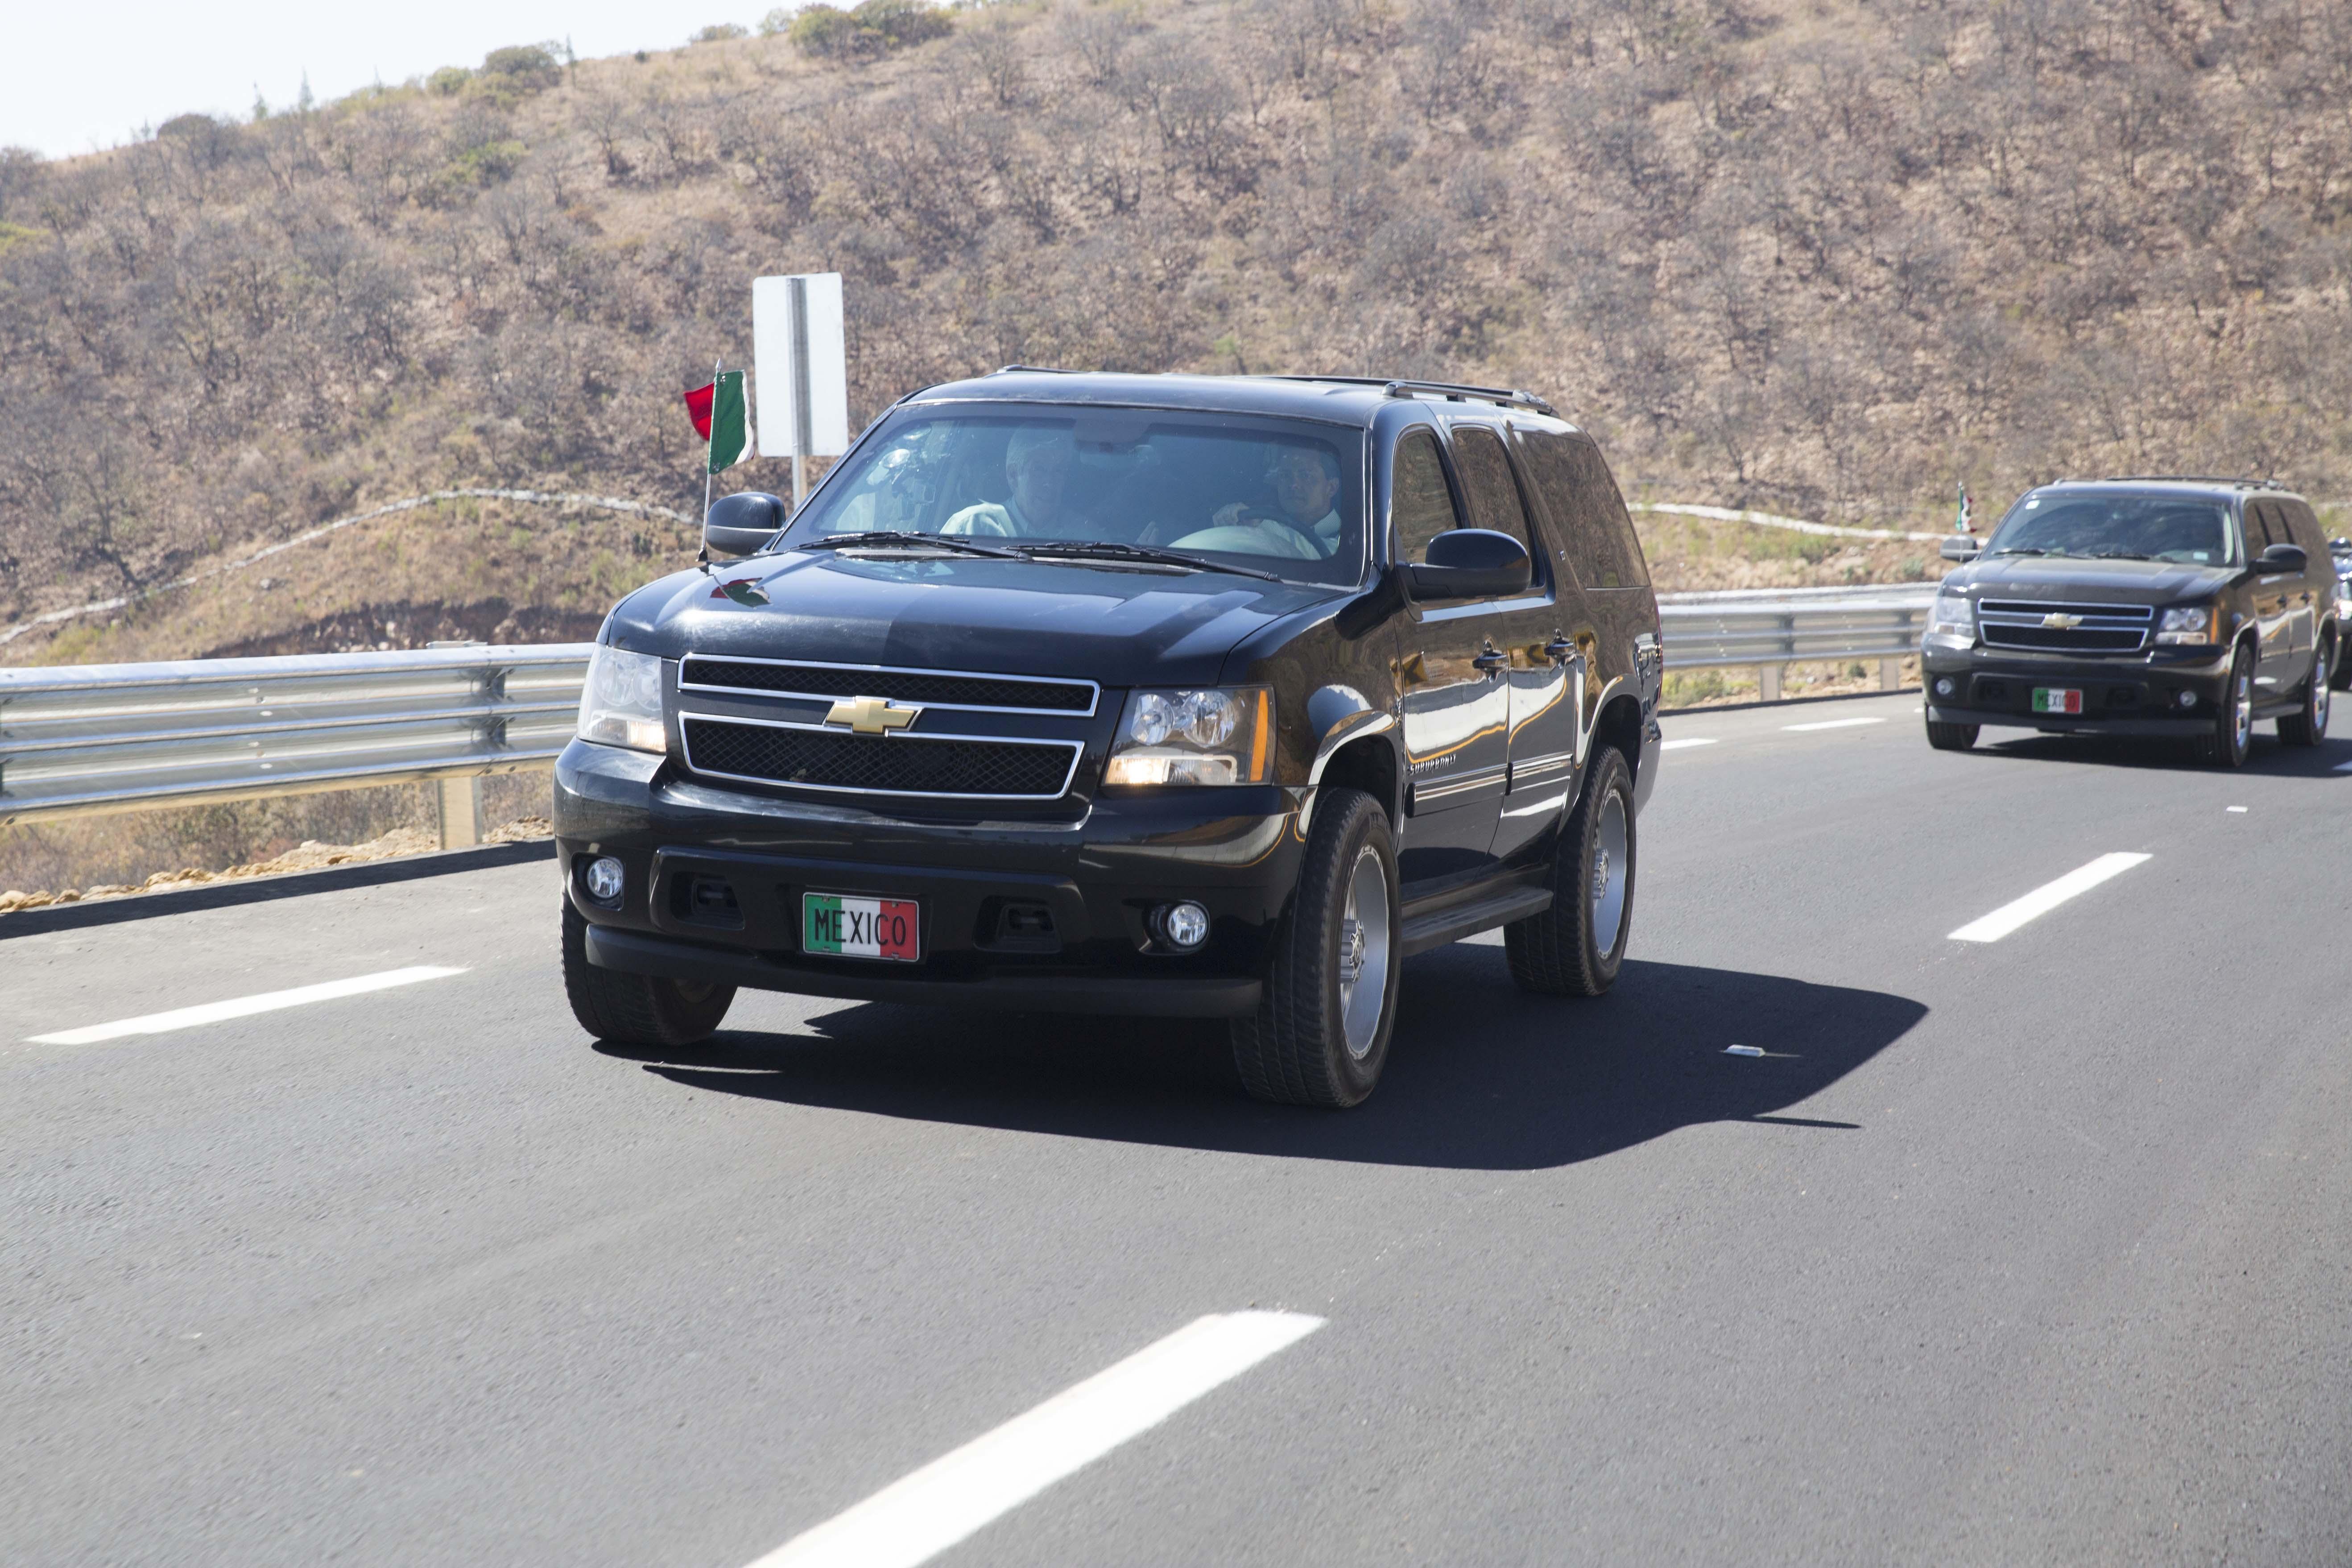 autopista amecameca cuautla 13278269205 ojpg